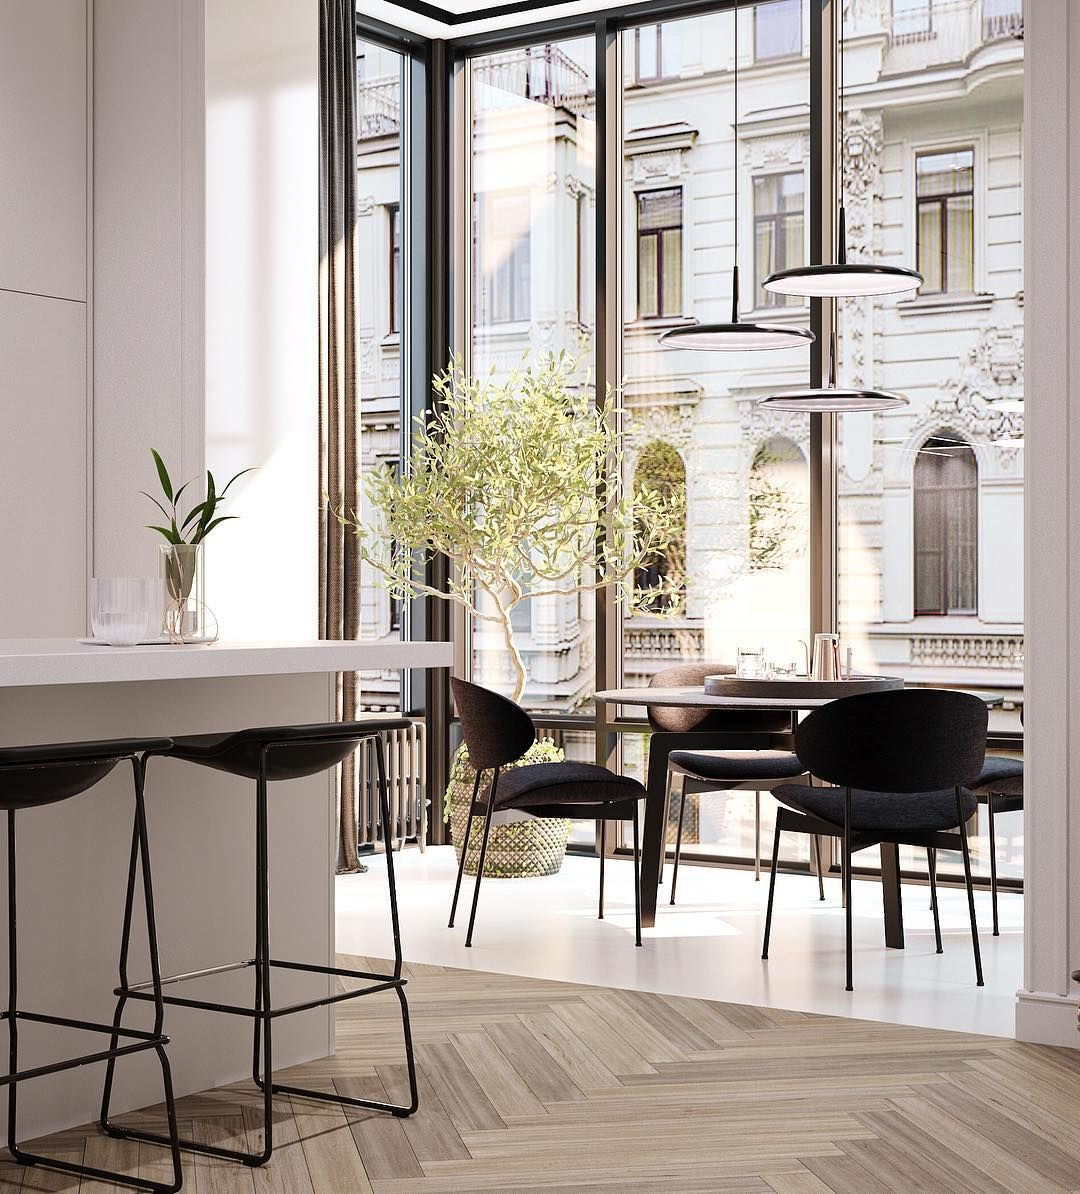 Dining nook kitchen chairs table interior also home design in interiors apartamento decoracao rh br pinterest